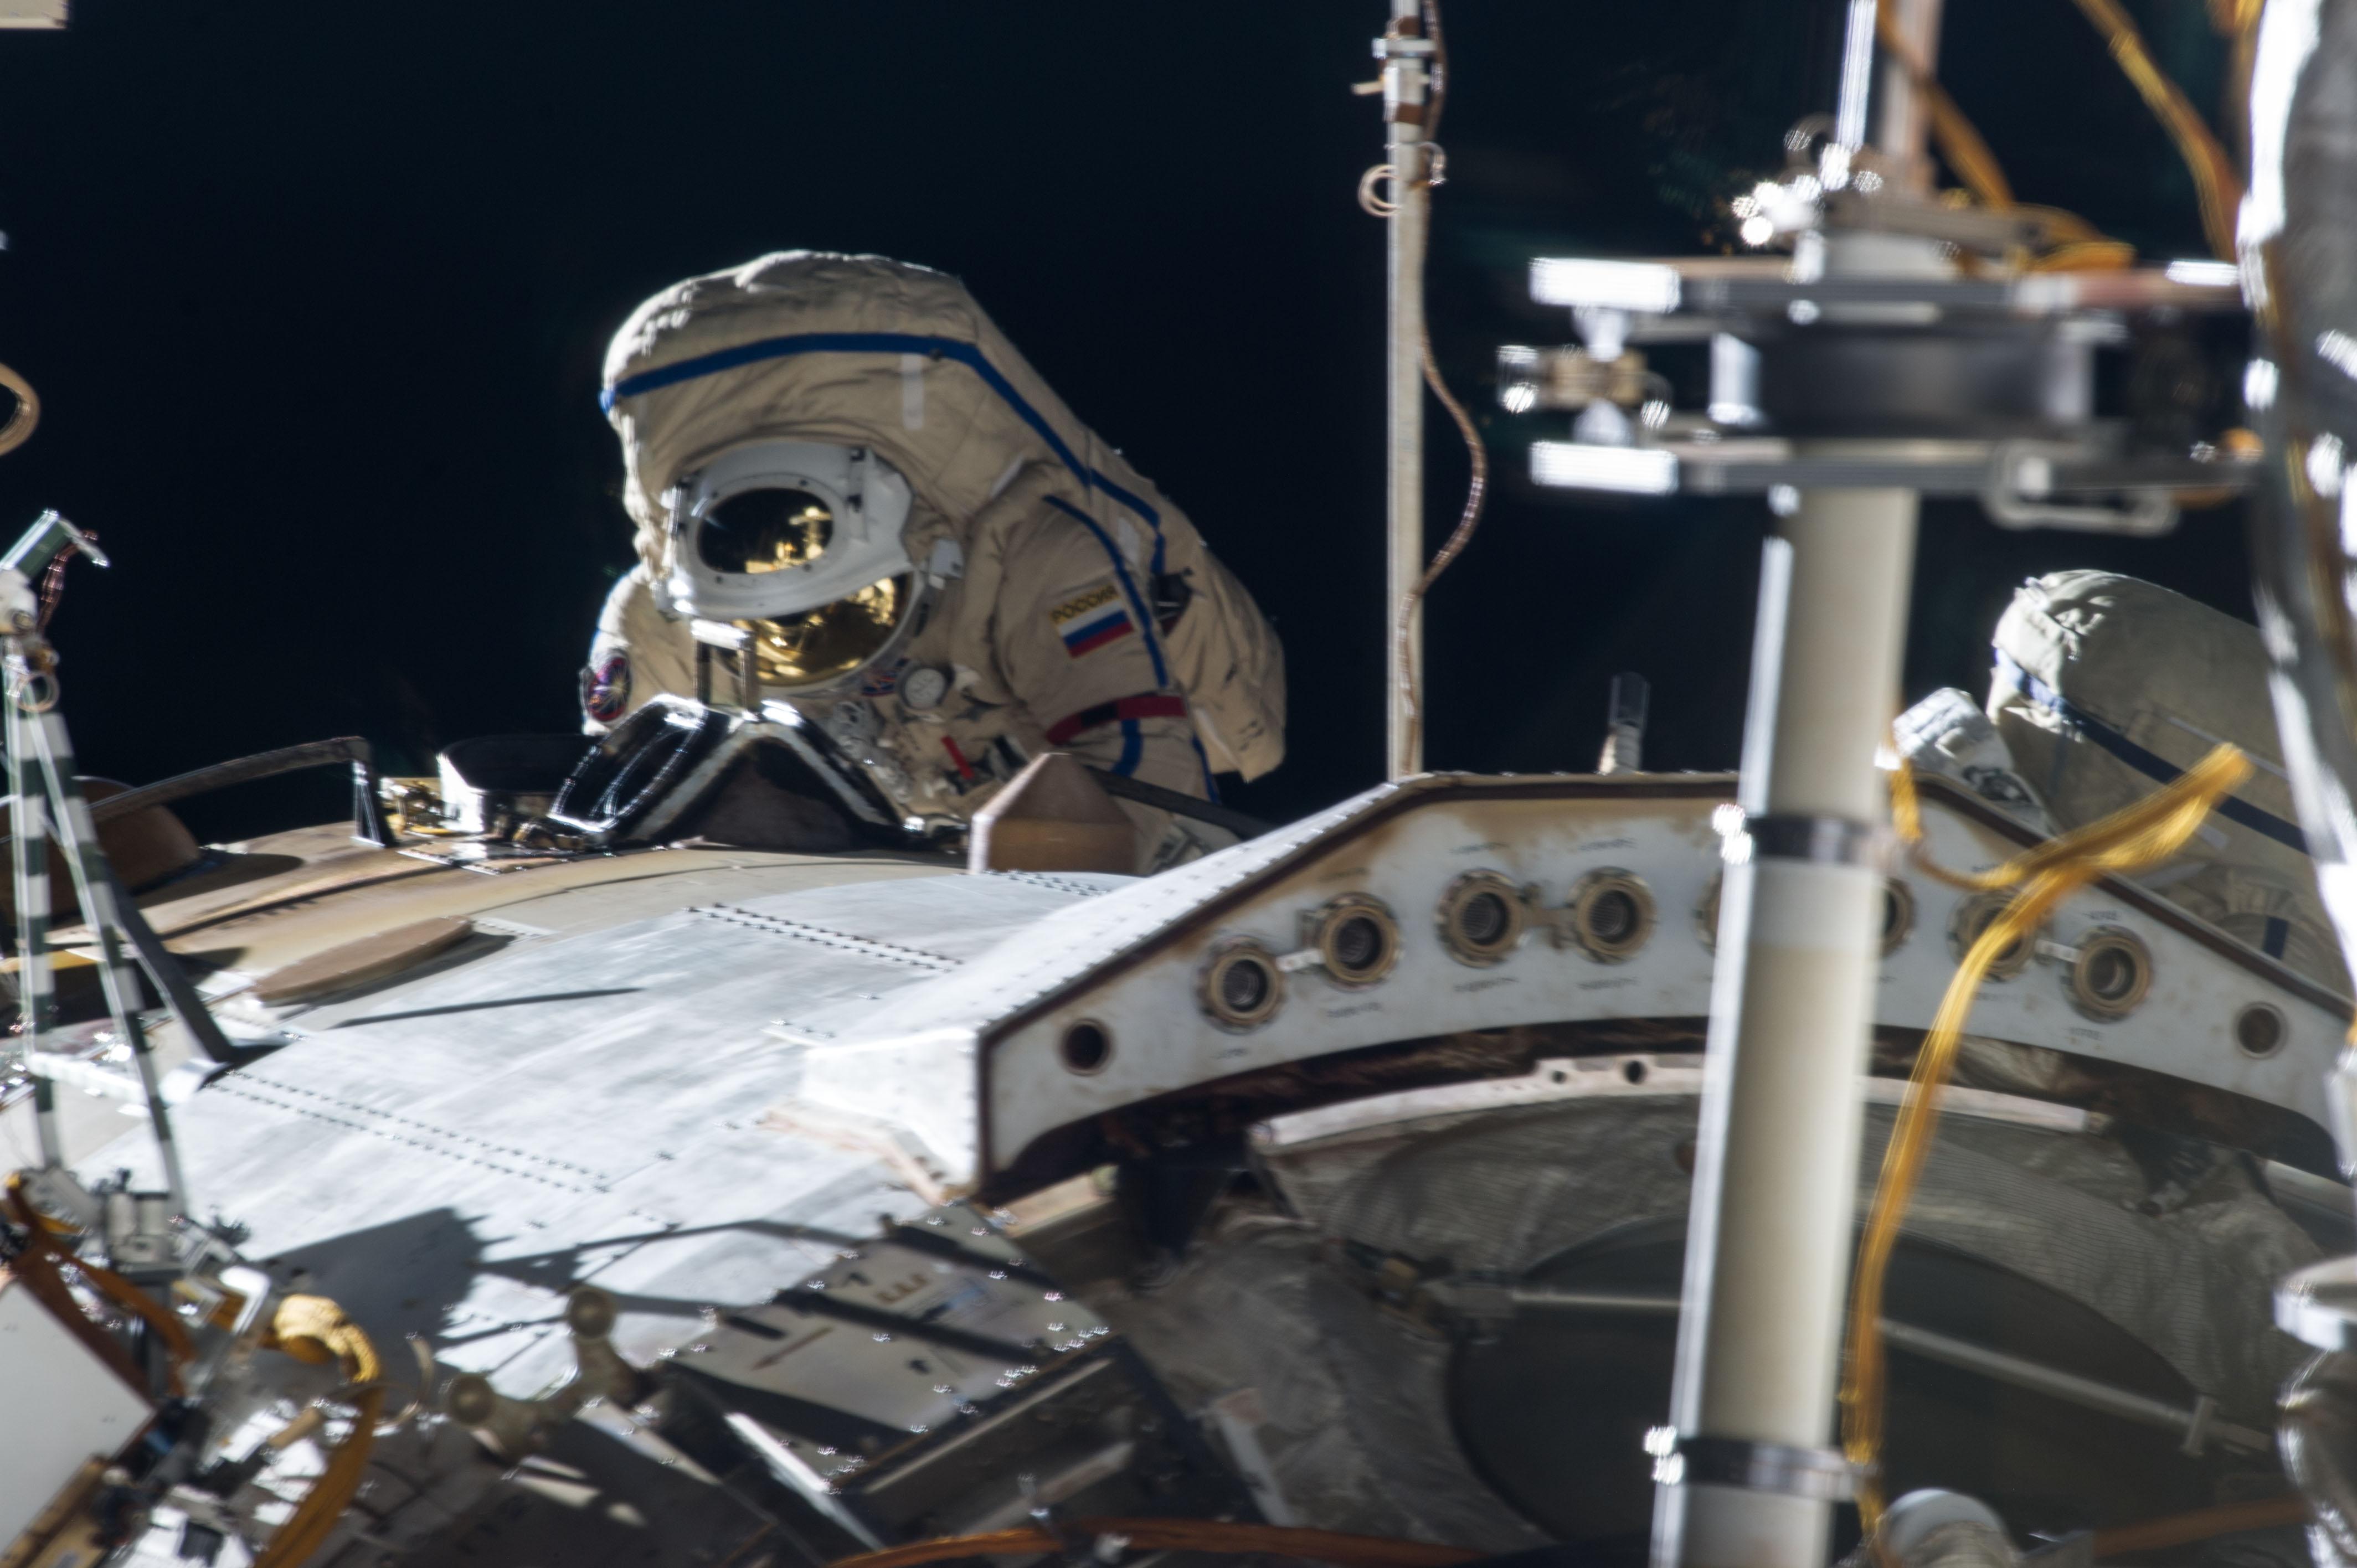 Expedition 35 Russian Cosmonaut Pavel Vinogradov on Spacewalk